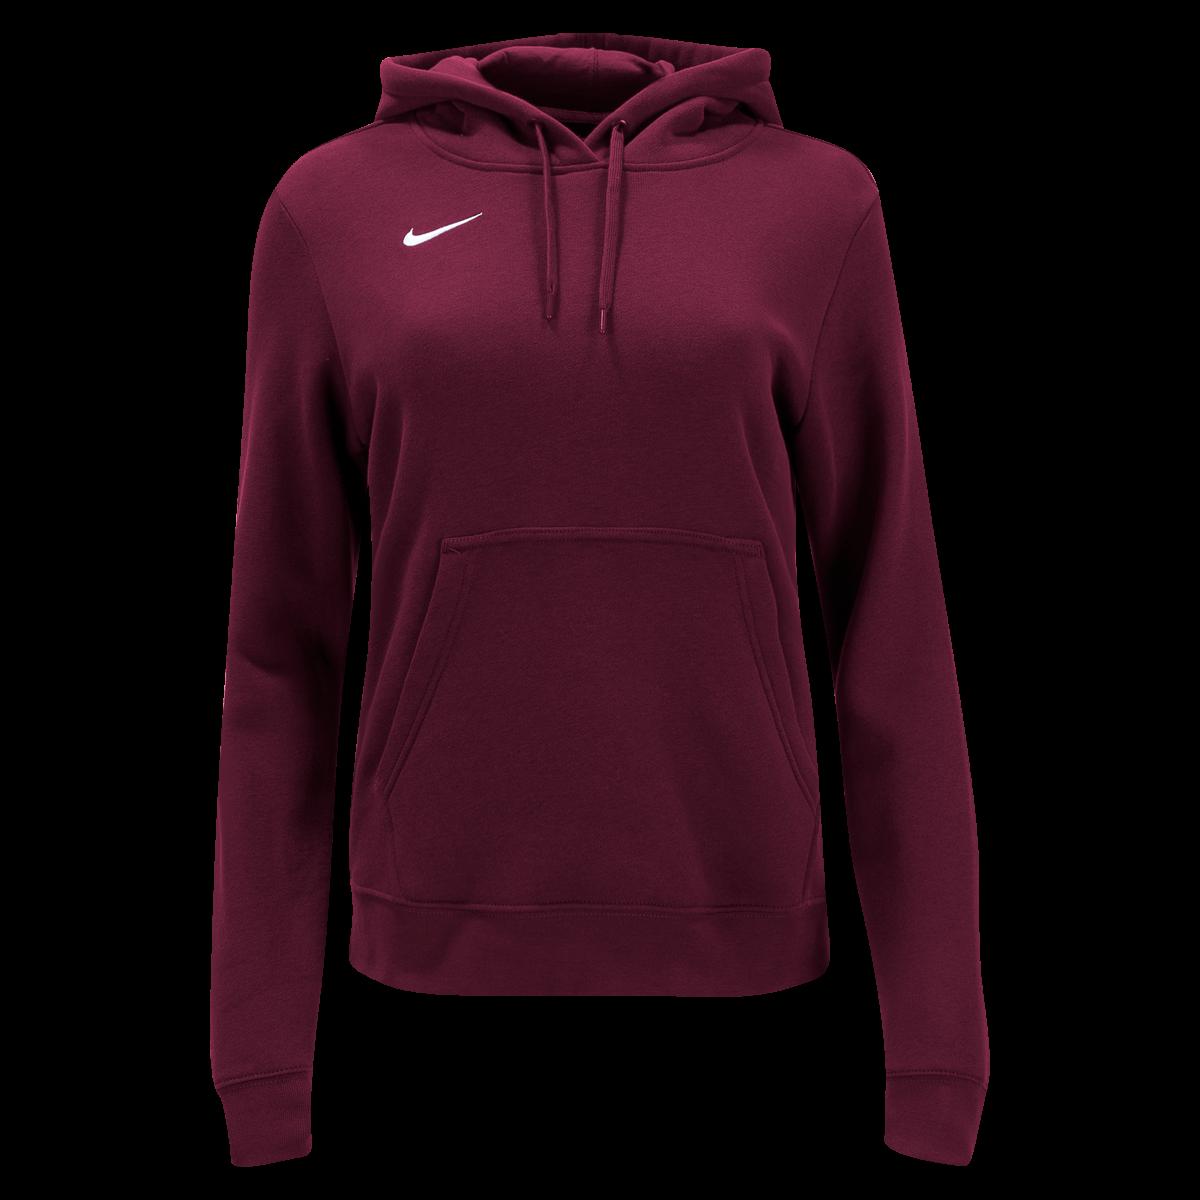 Pin By Jada Patrick On Closet Nike Jackets Women Nike Hoodies For Women Red Nike Hoodie [ 1200 x 1200 Pixel ]